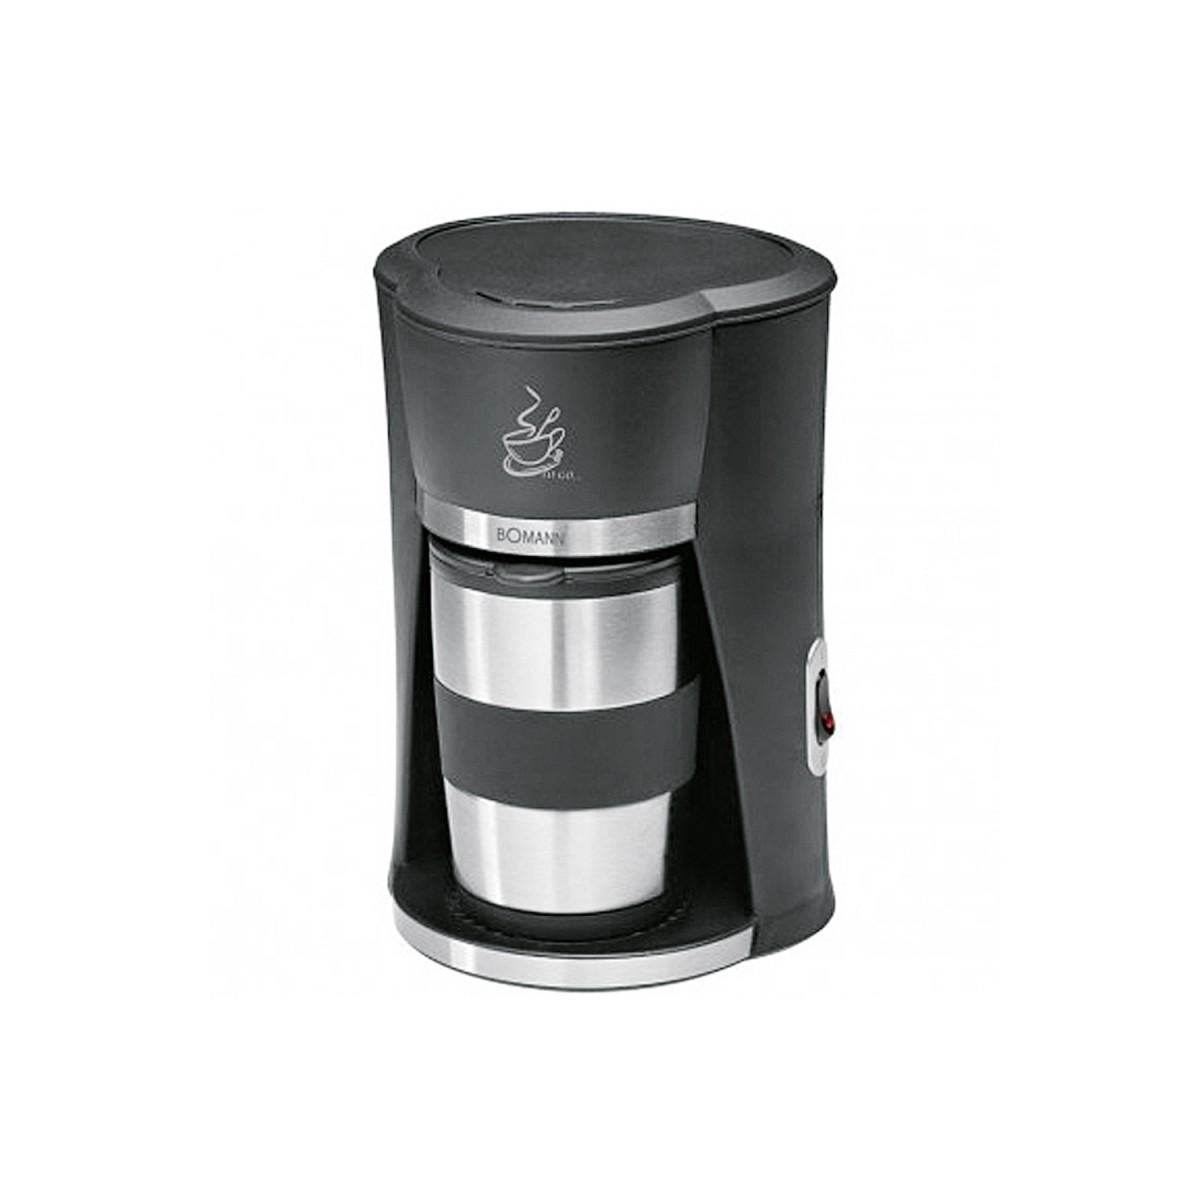 bomann ka 180 cb kaffeemaschine f r 1 2 tassen 1 st ck. Black Bedroom Furniture Sets. Home Design Ideas